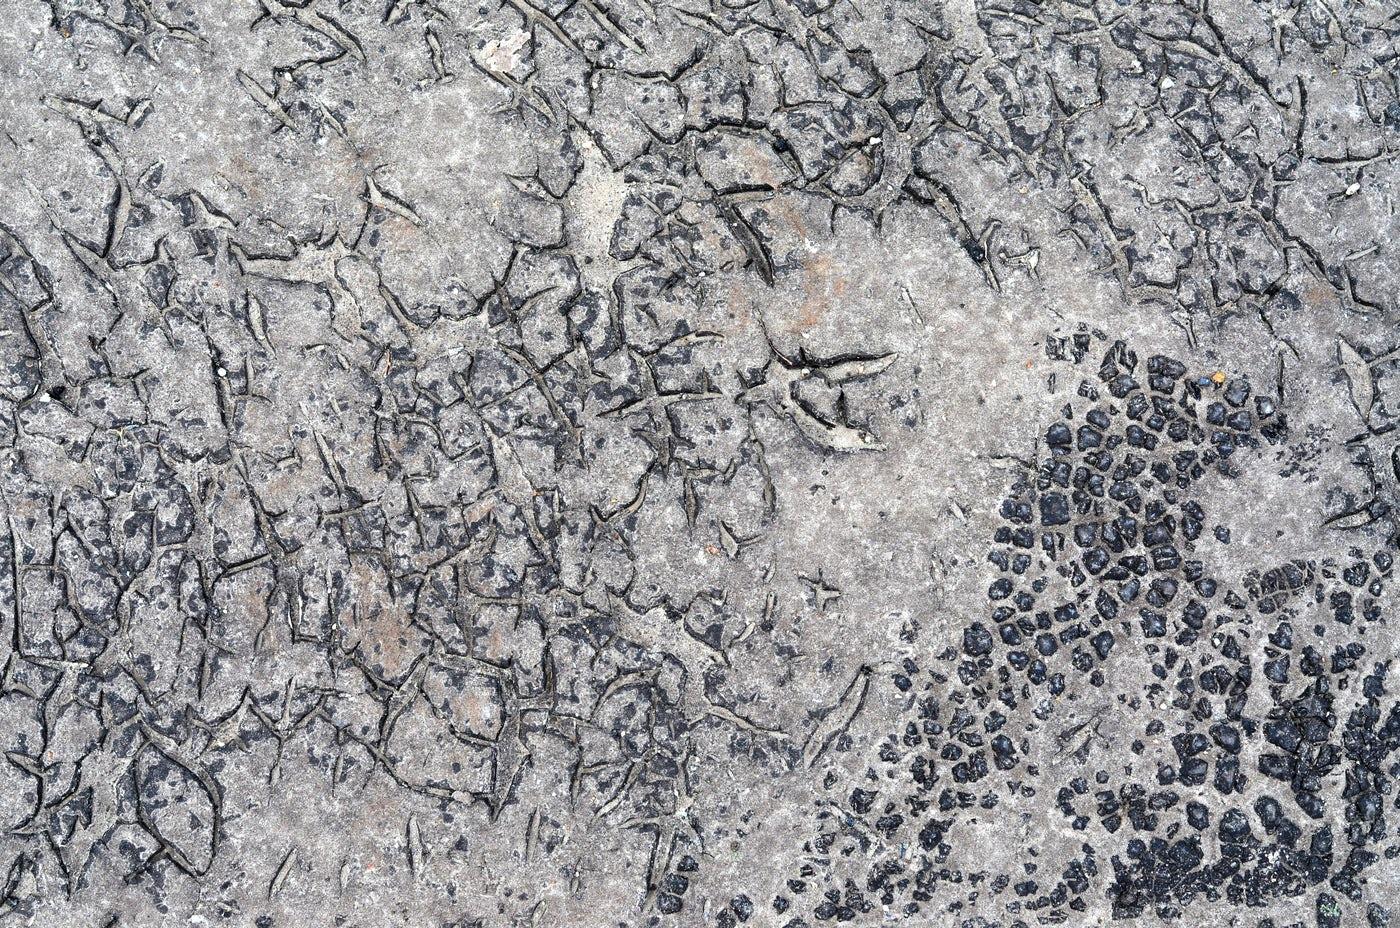 Cracks In Asphalt: Stock Photos